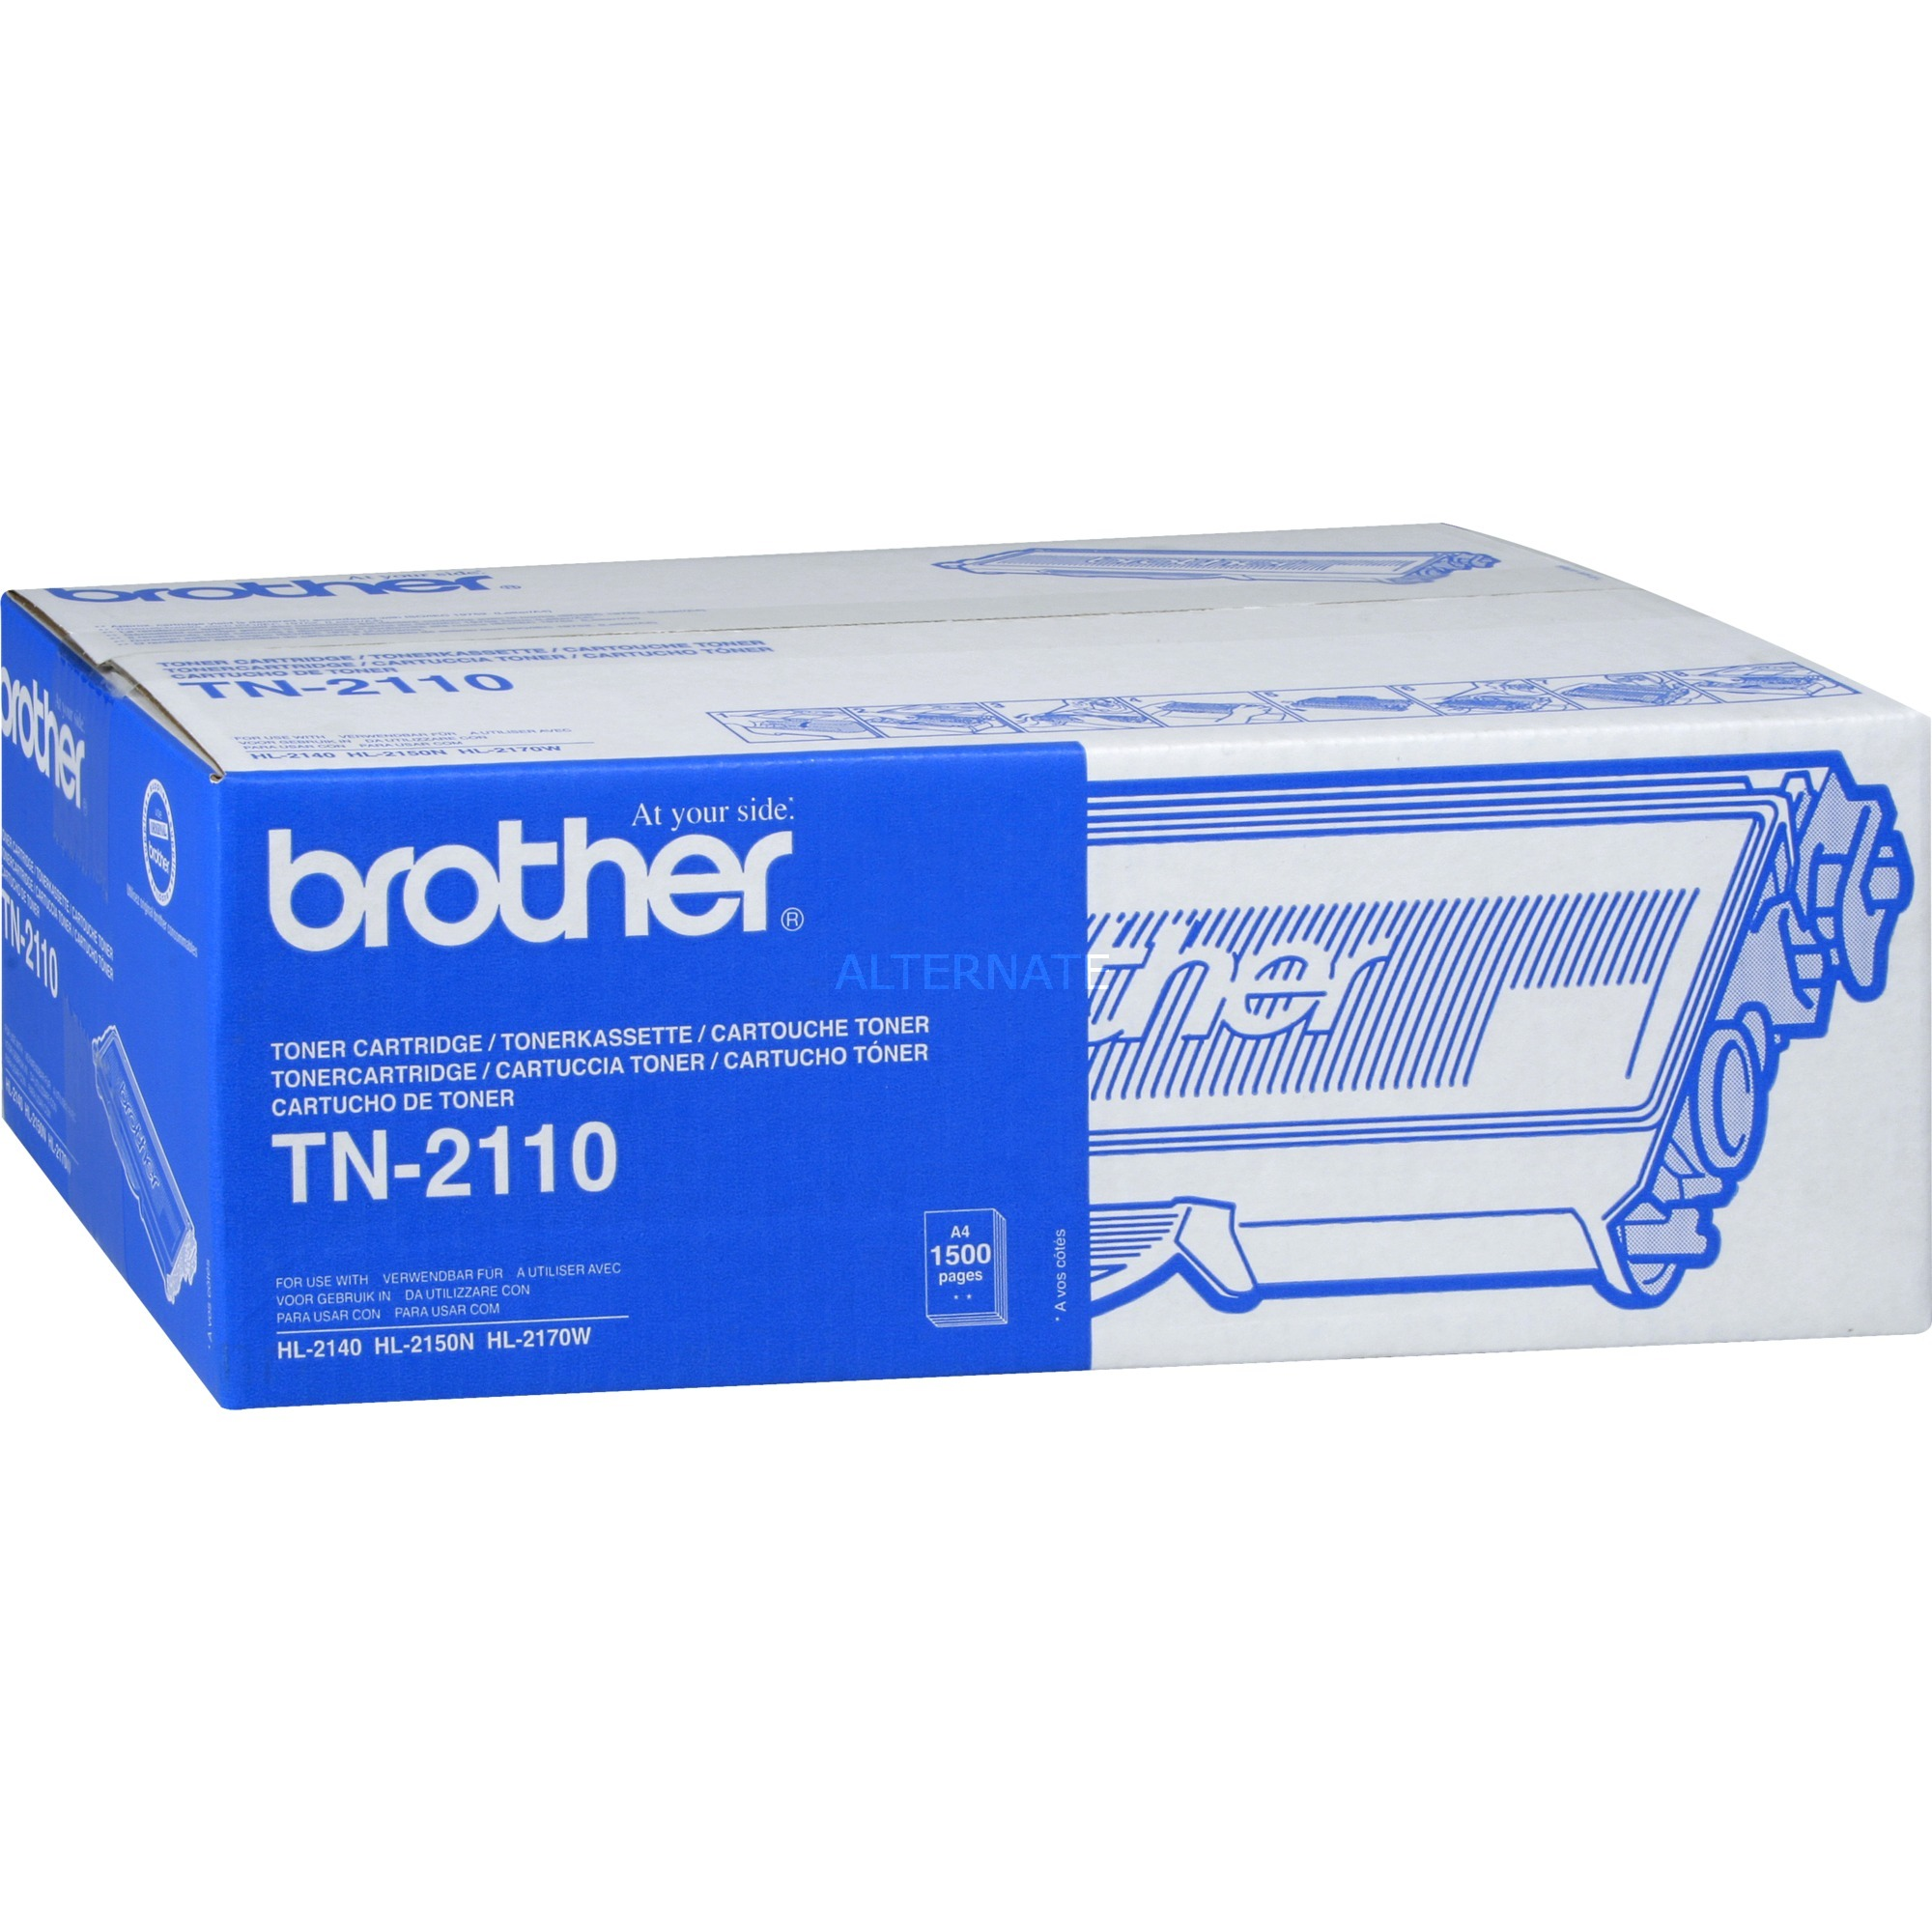 TN-2110 - Cartouche d'encre - Toner